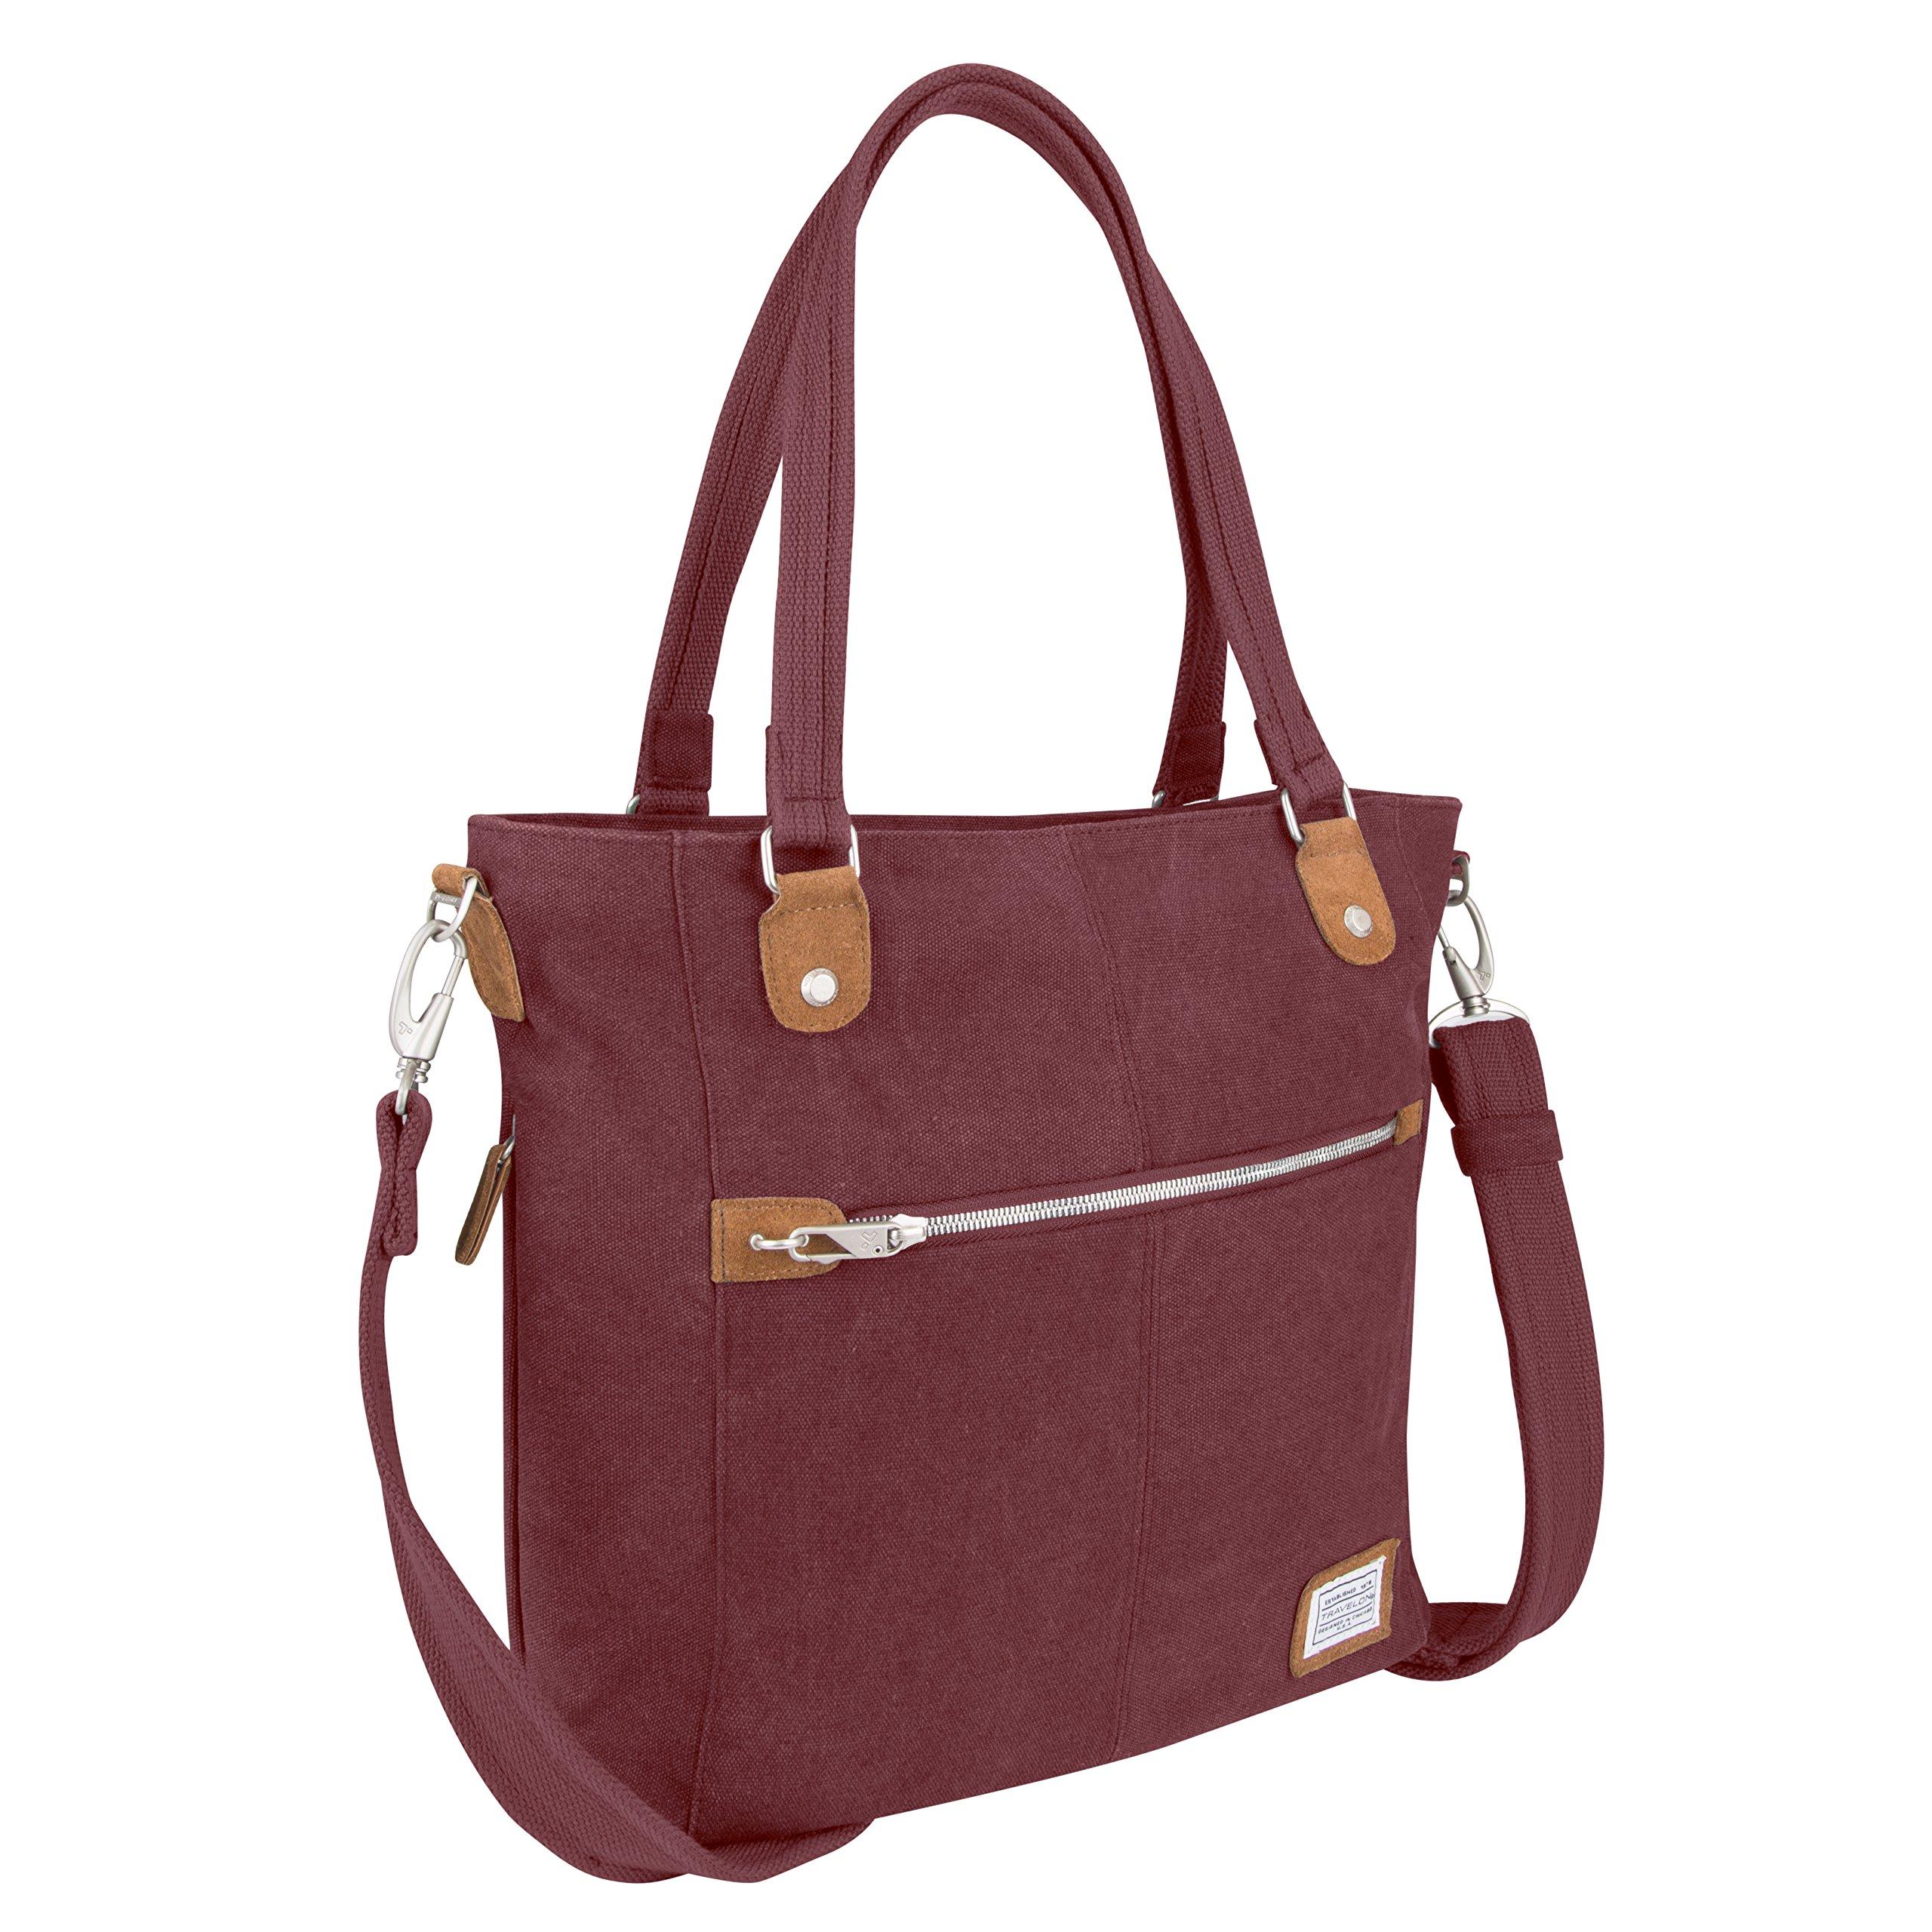 Travelon Anti-Theft Heritage Tote Bag, Wine